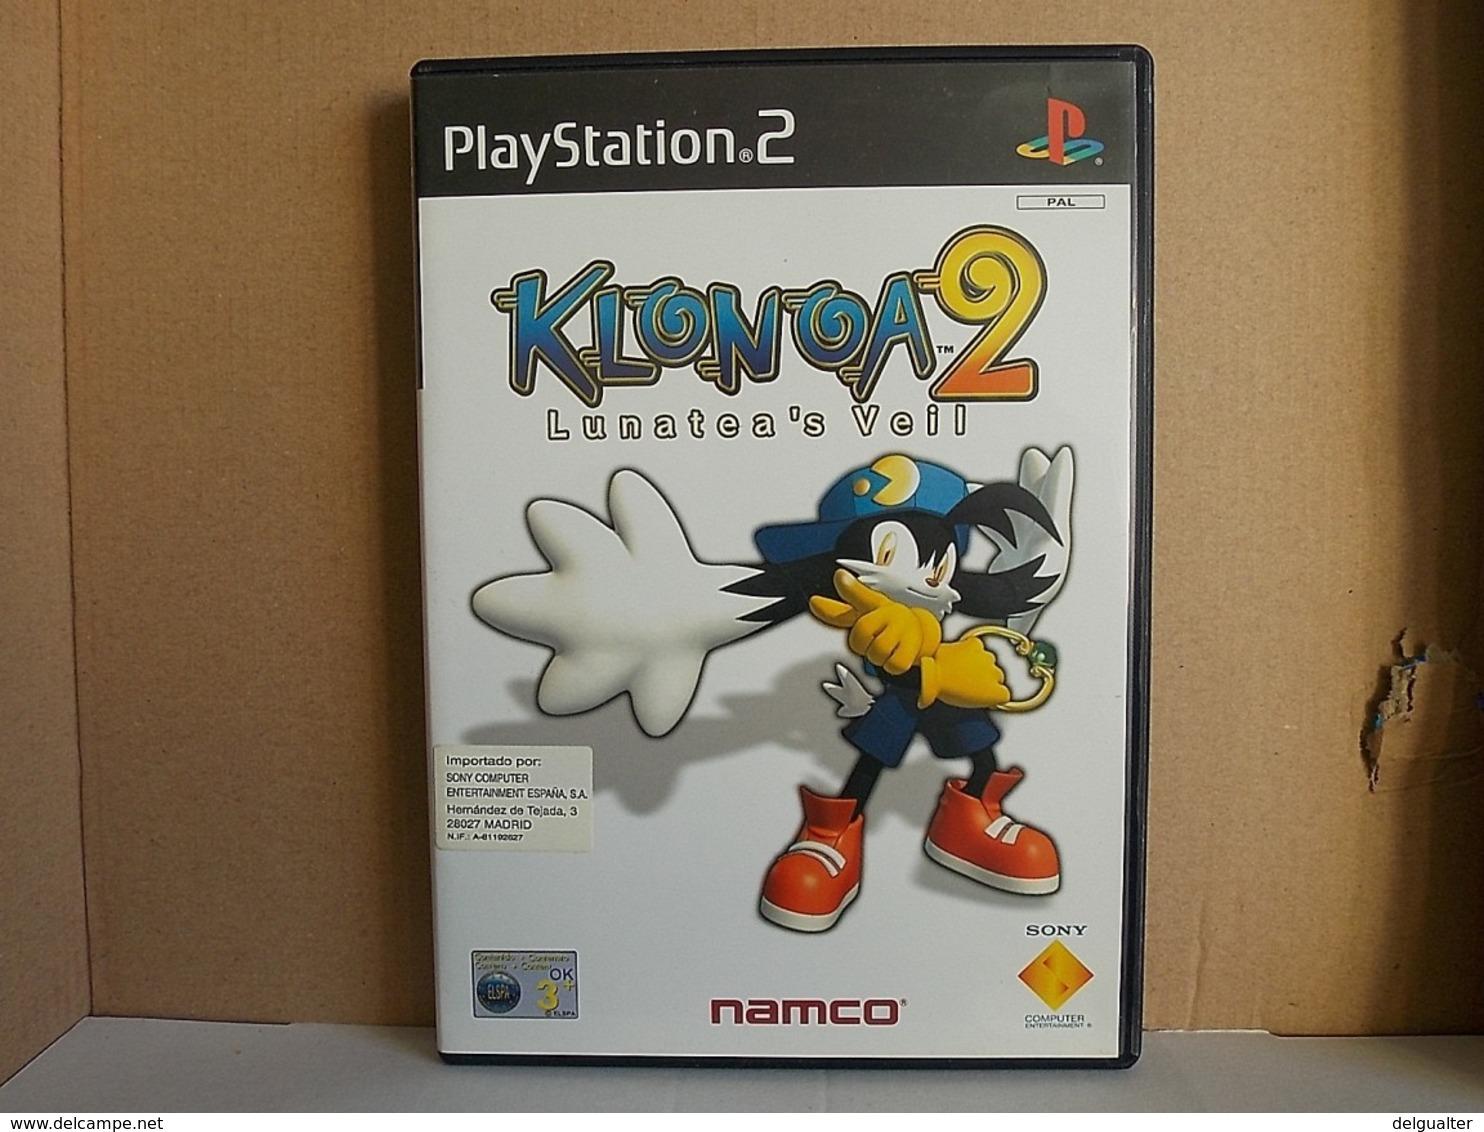 PS2 Game * Klonoa 2 Lunatea's Veil - Sony PlayStation